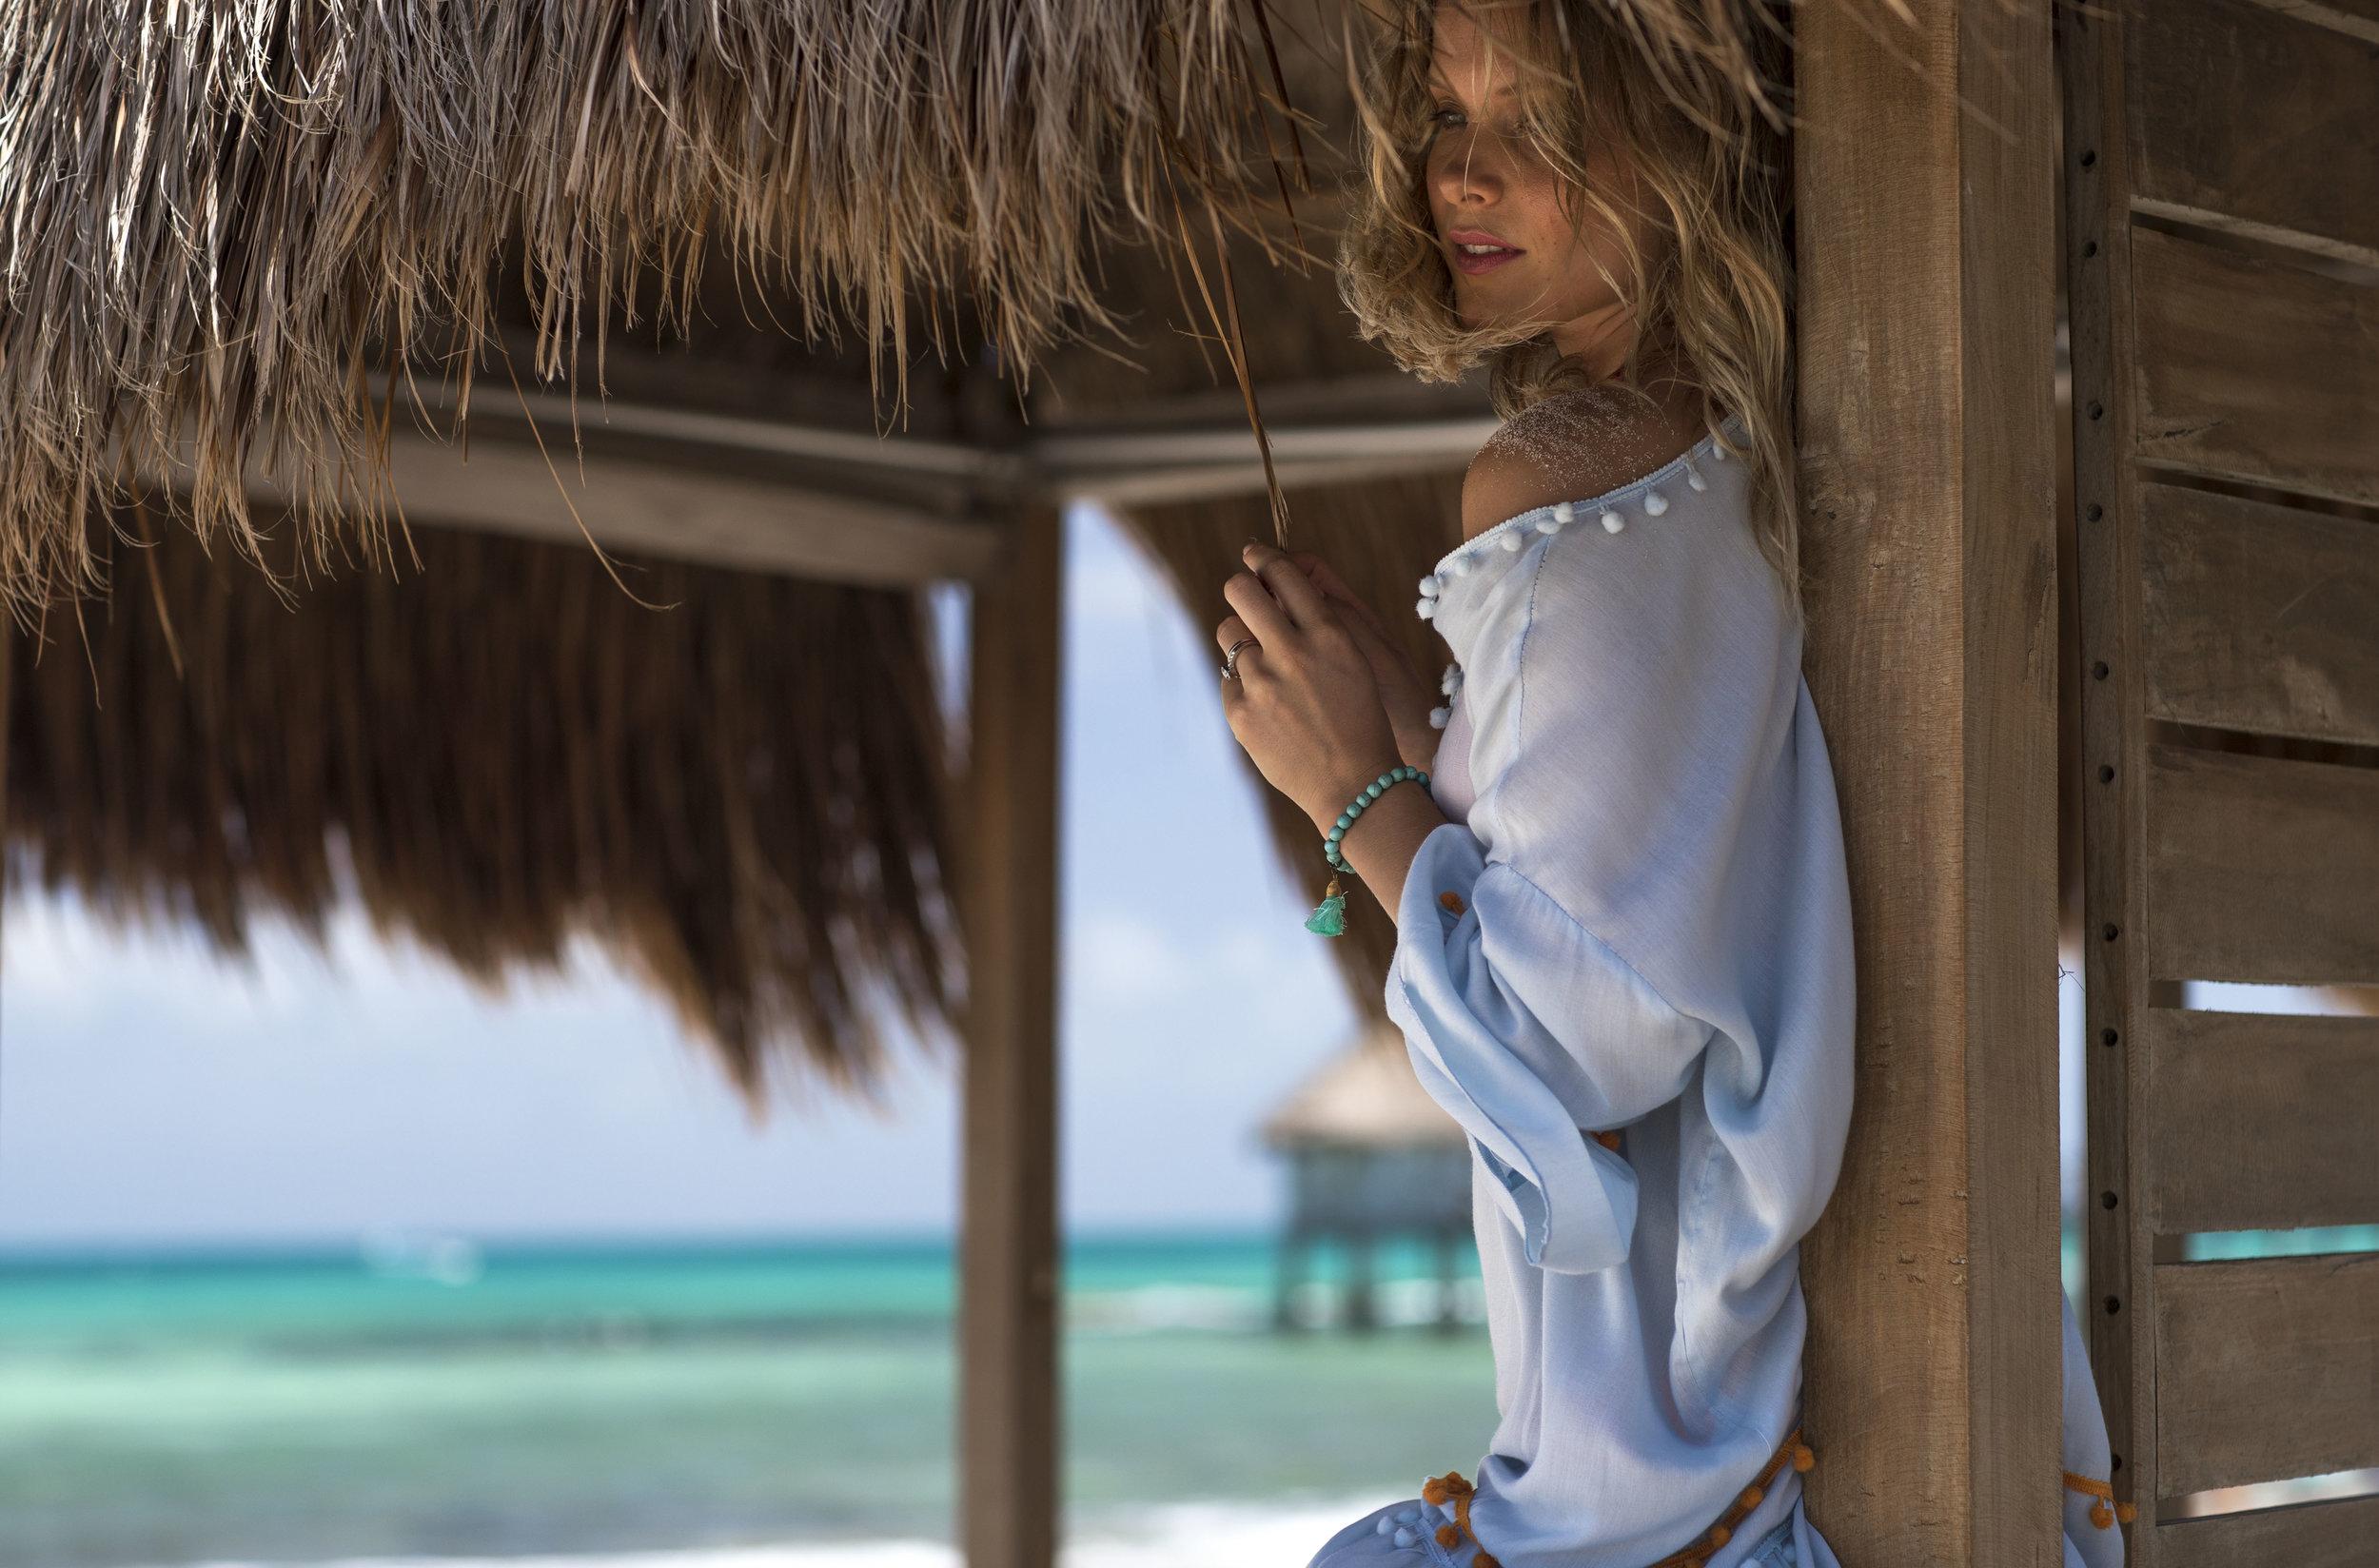 VID_RM_Beach_Day_Woman_Cabana.jpg